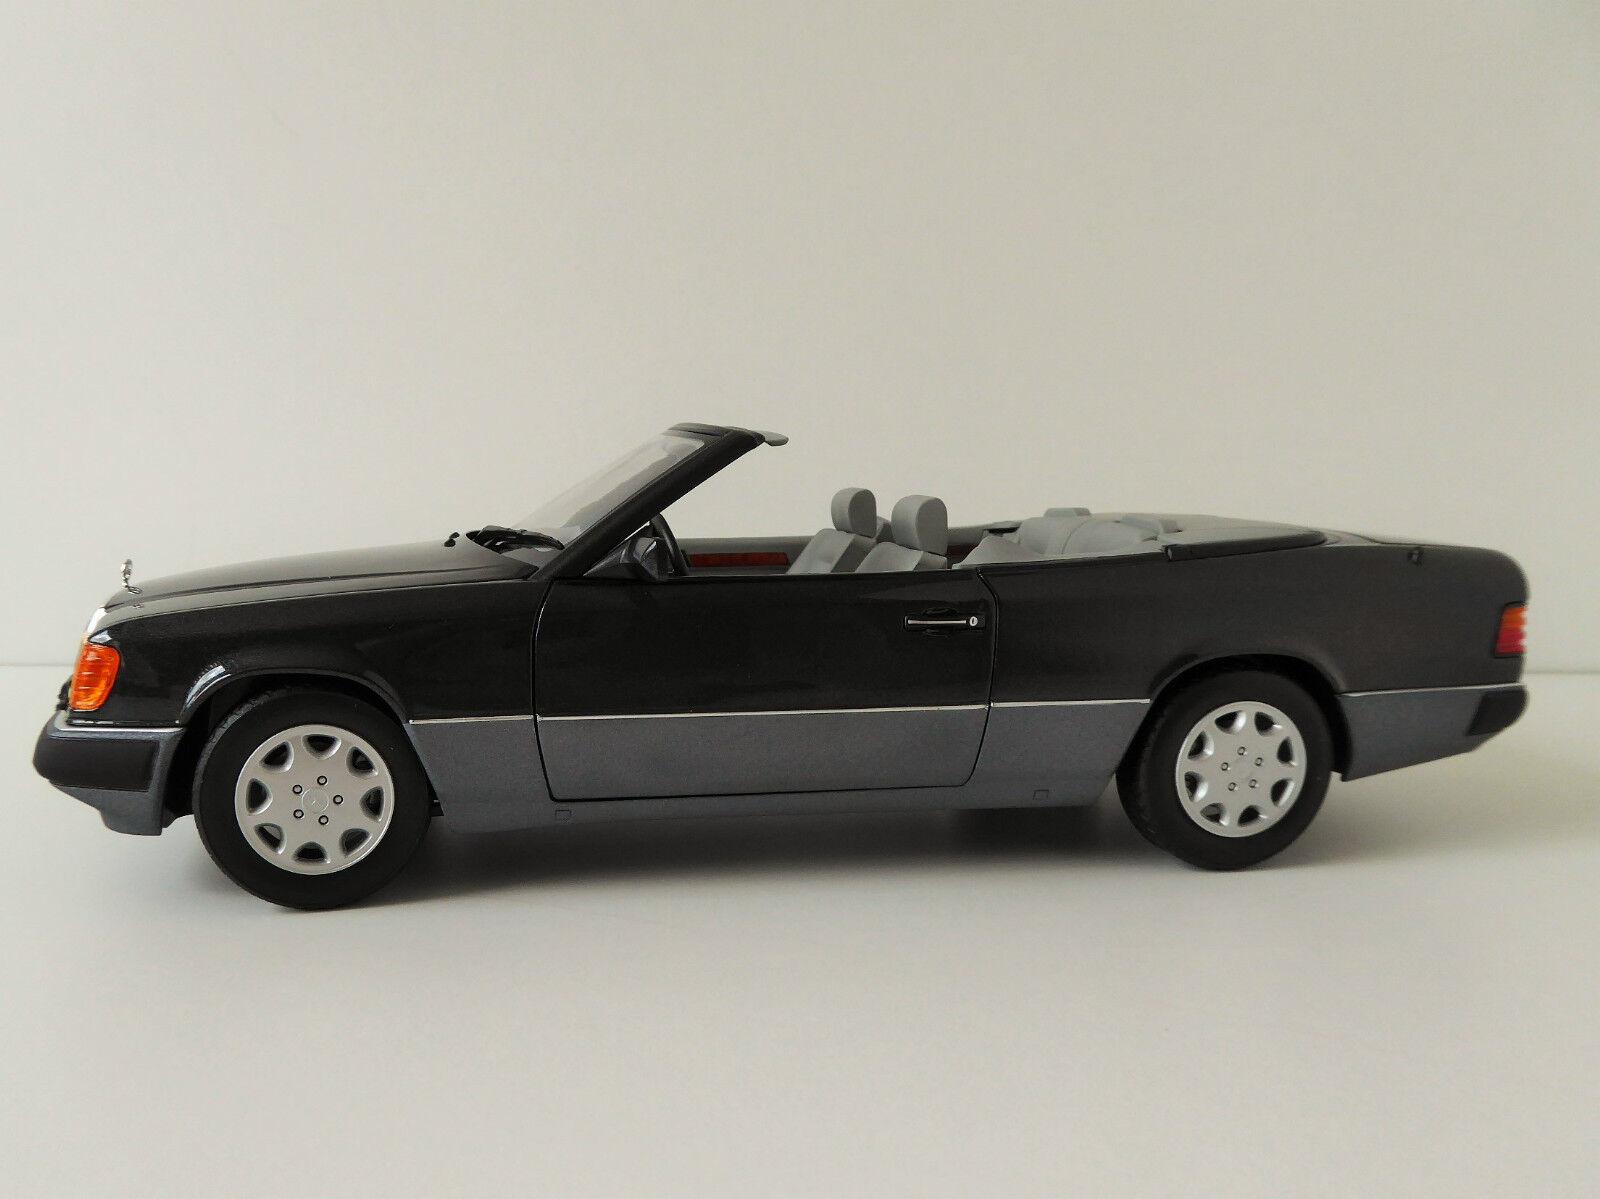 Mercedes-Benz 300 ce-24 cabriolet 1 18 CABRIOLET MERCEDES I-Norev b66040617 a124 CE